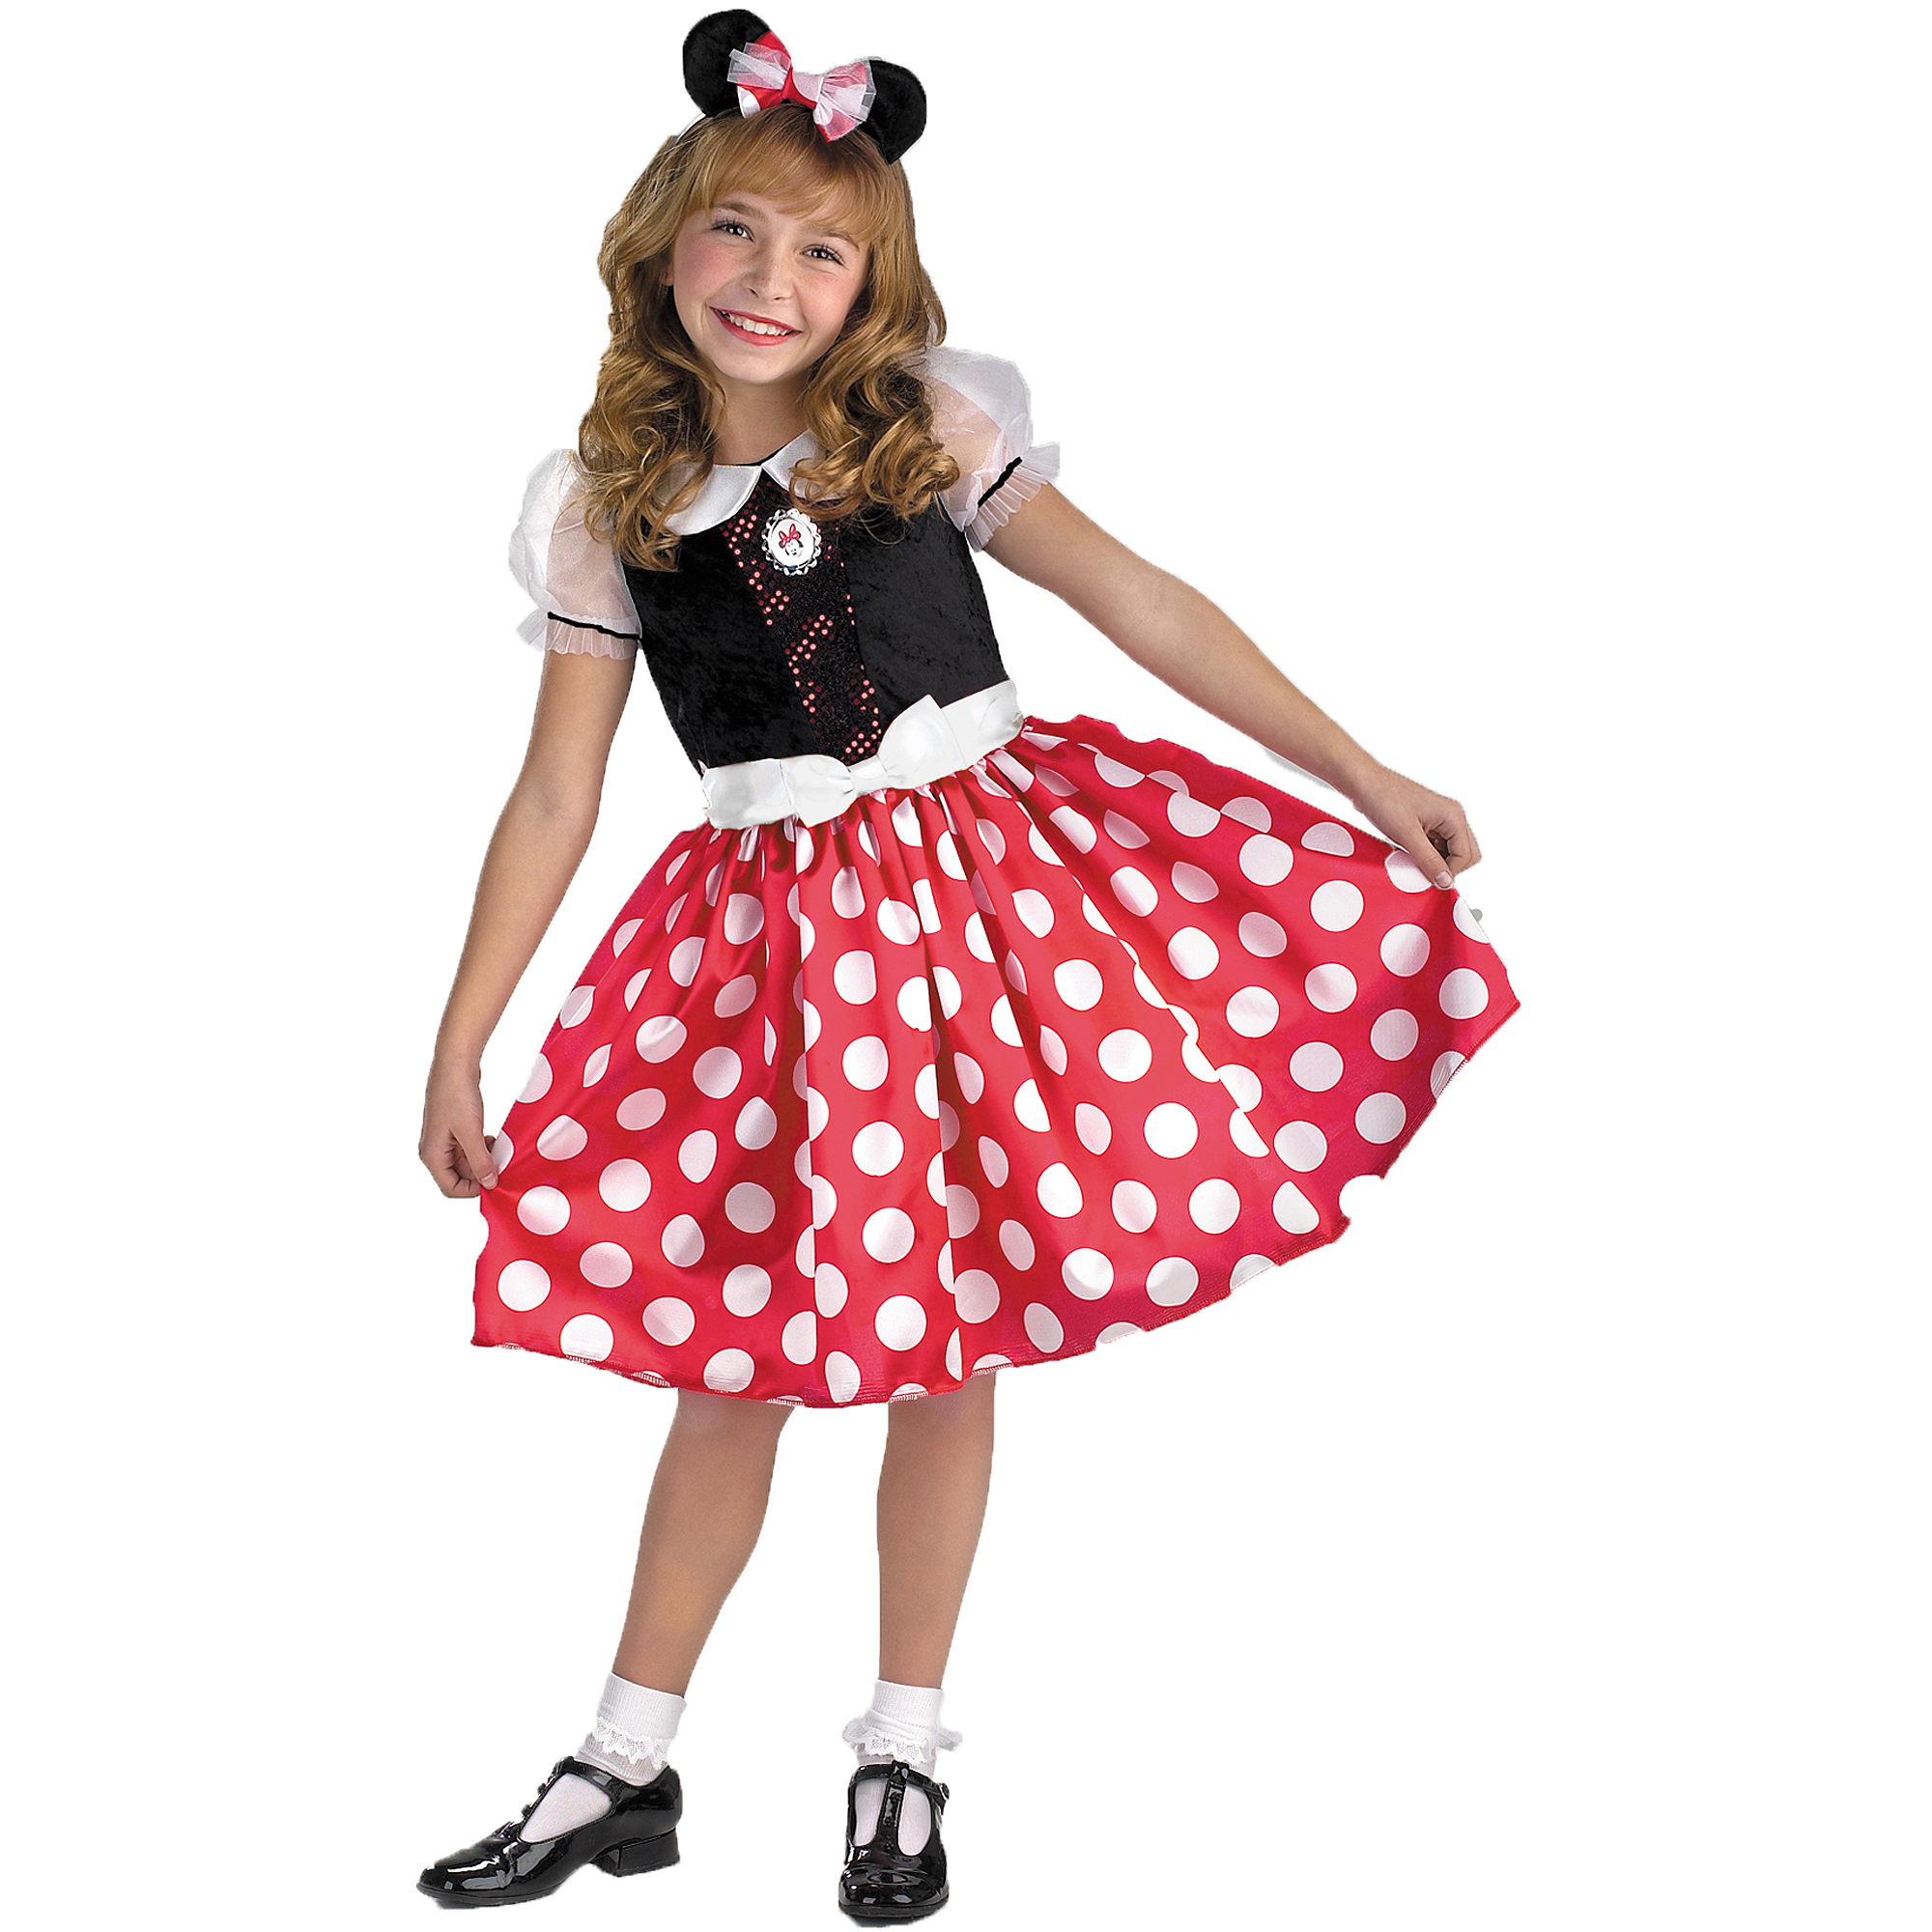 Minnie Mouse Child Halloween Costume